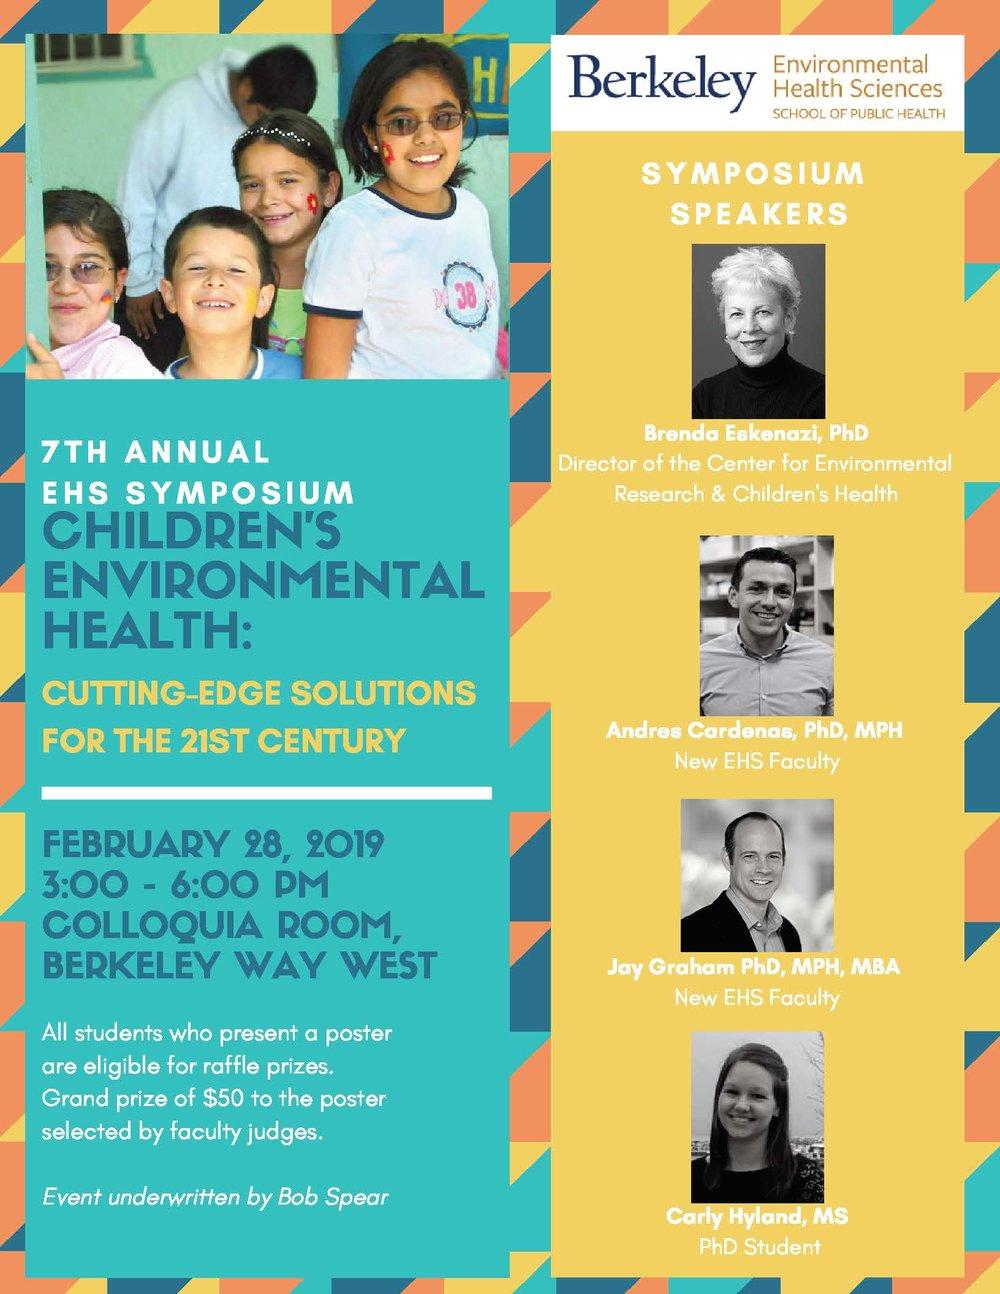 7th annual EHS Symposium.jpg